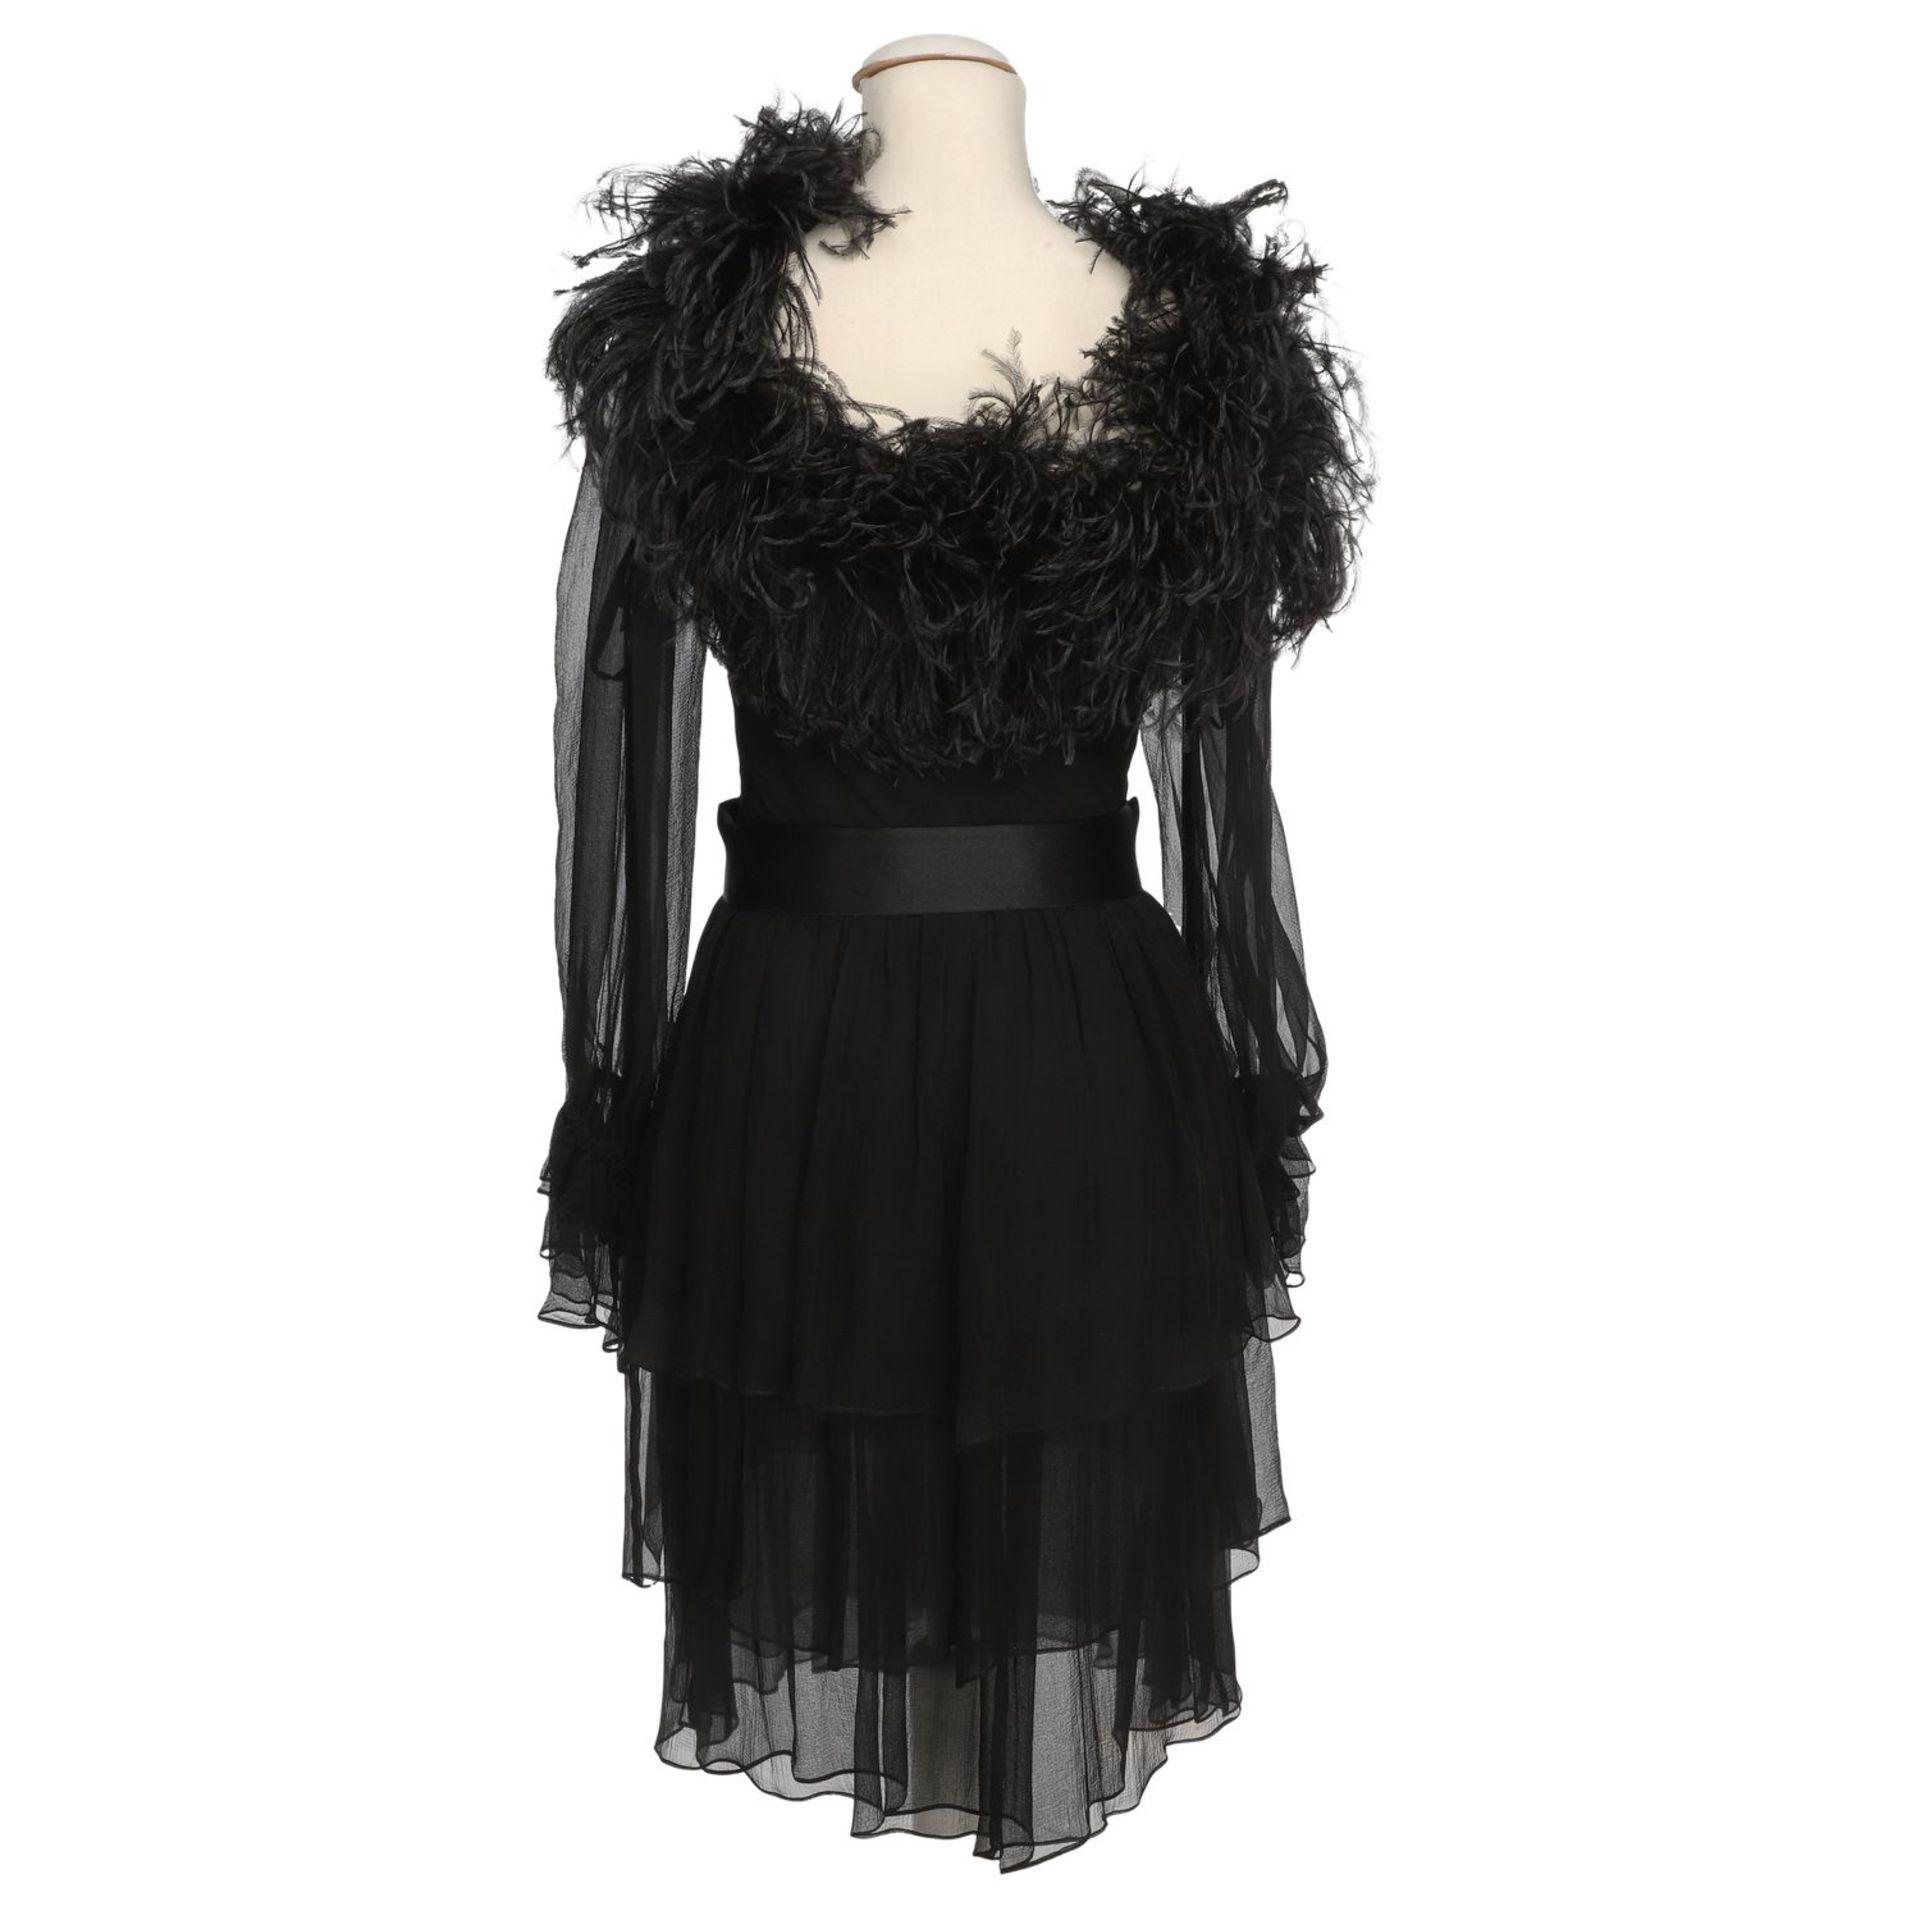 YVES SAINT LAURENT VINTAGE Kleid, Herstellergröße 36. - Image 4 of 4